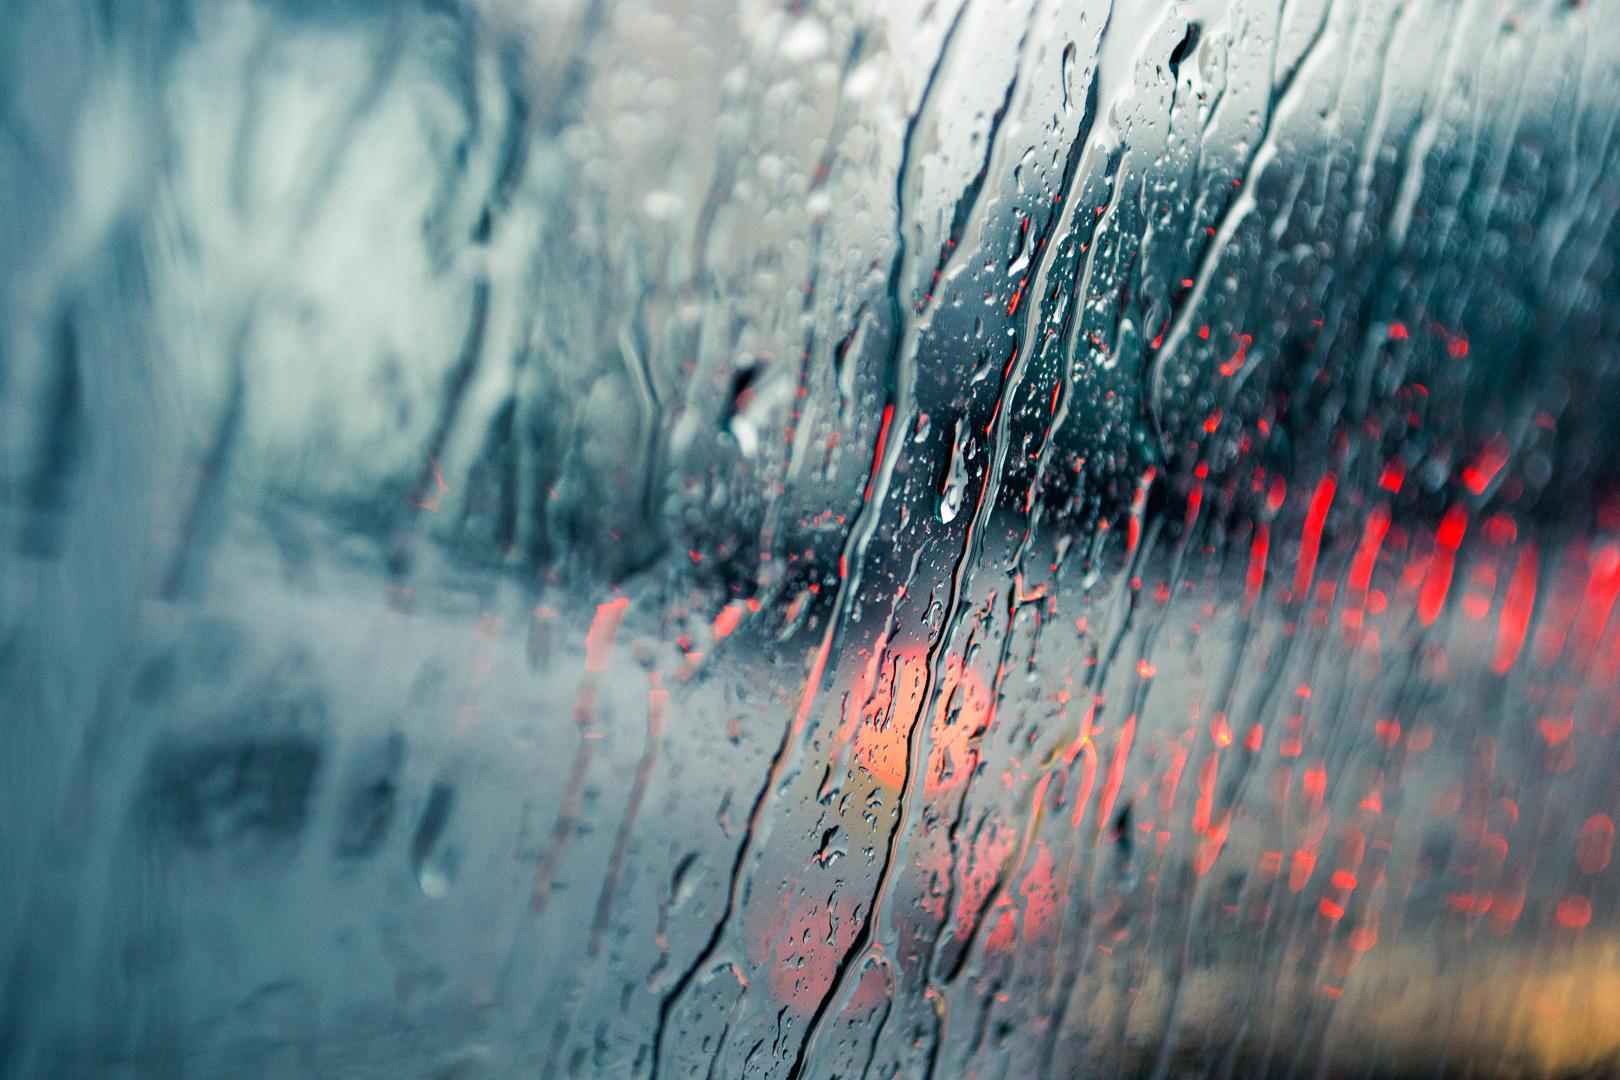 rainy weather hd wallpaper